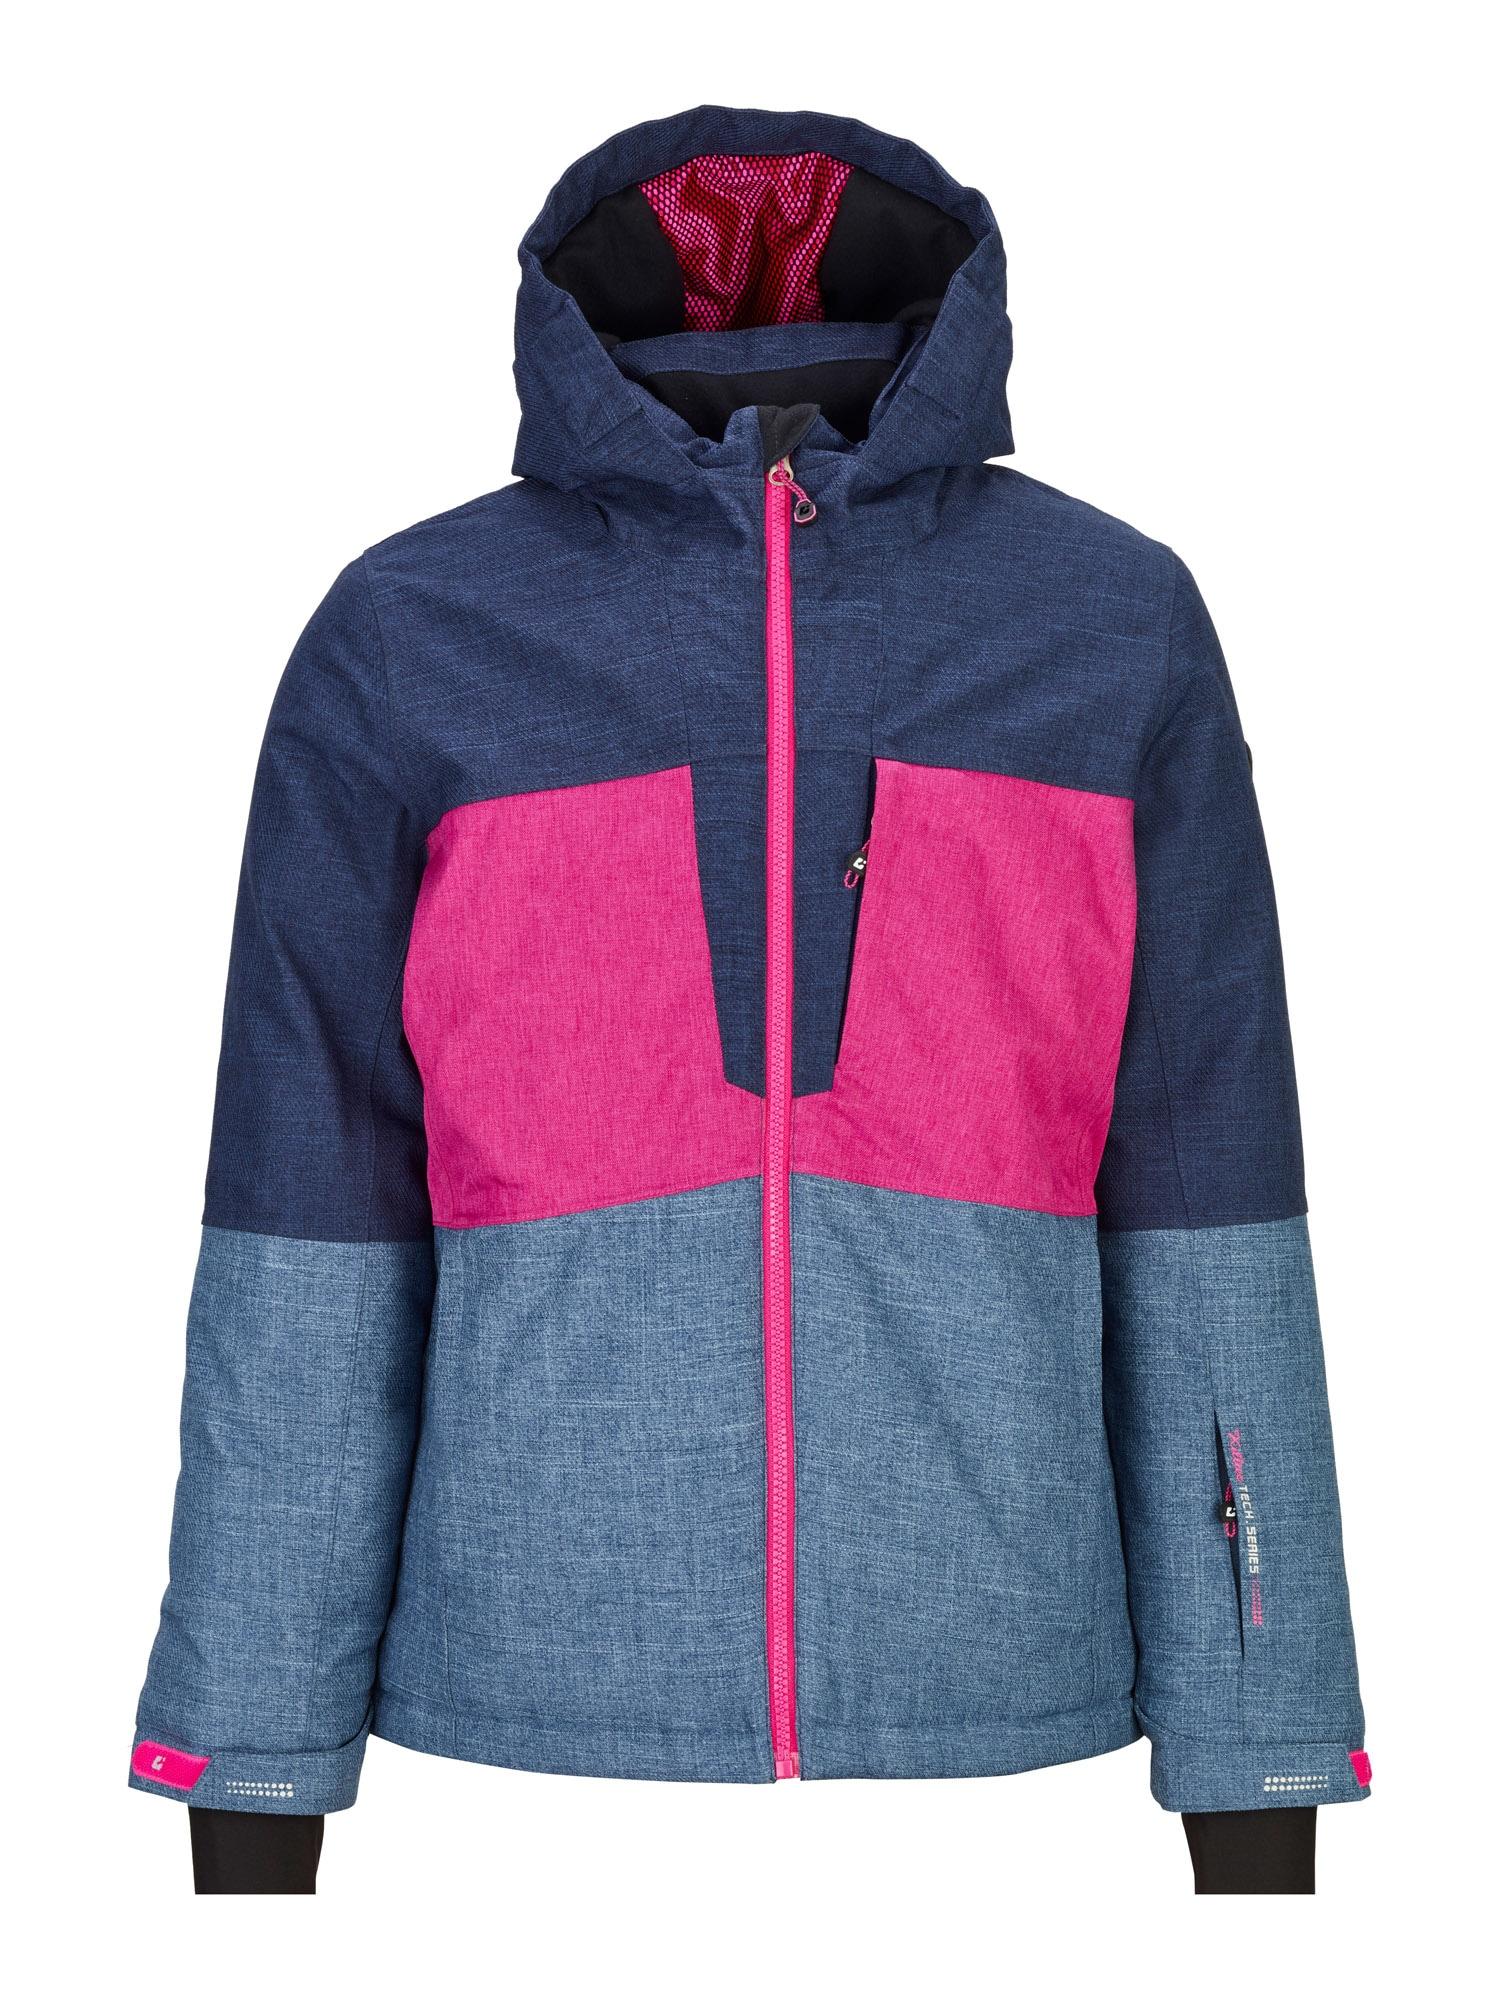 KILLTEC Outdoorová bunda 'Raakel'  pink / tmavě modrá / modrá džínovina